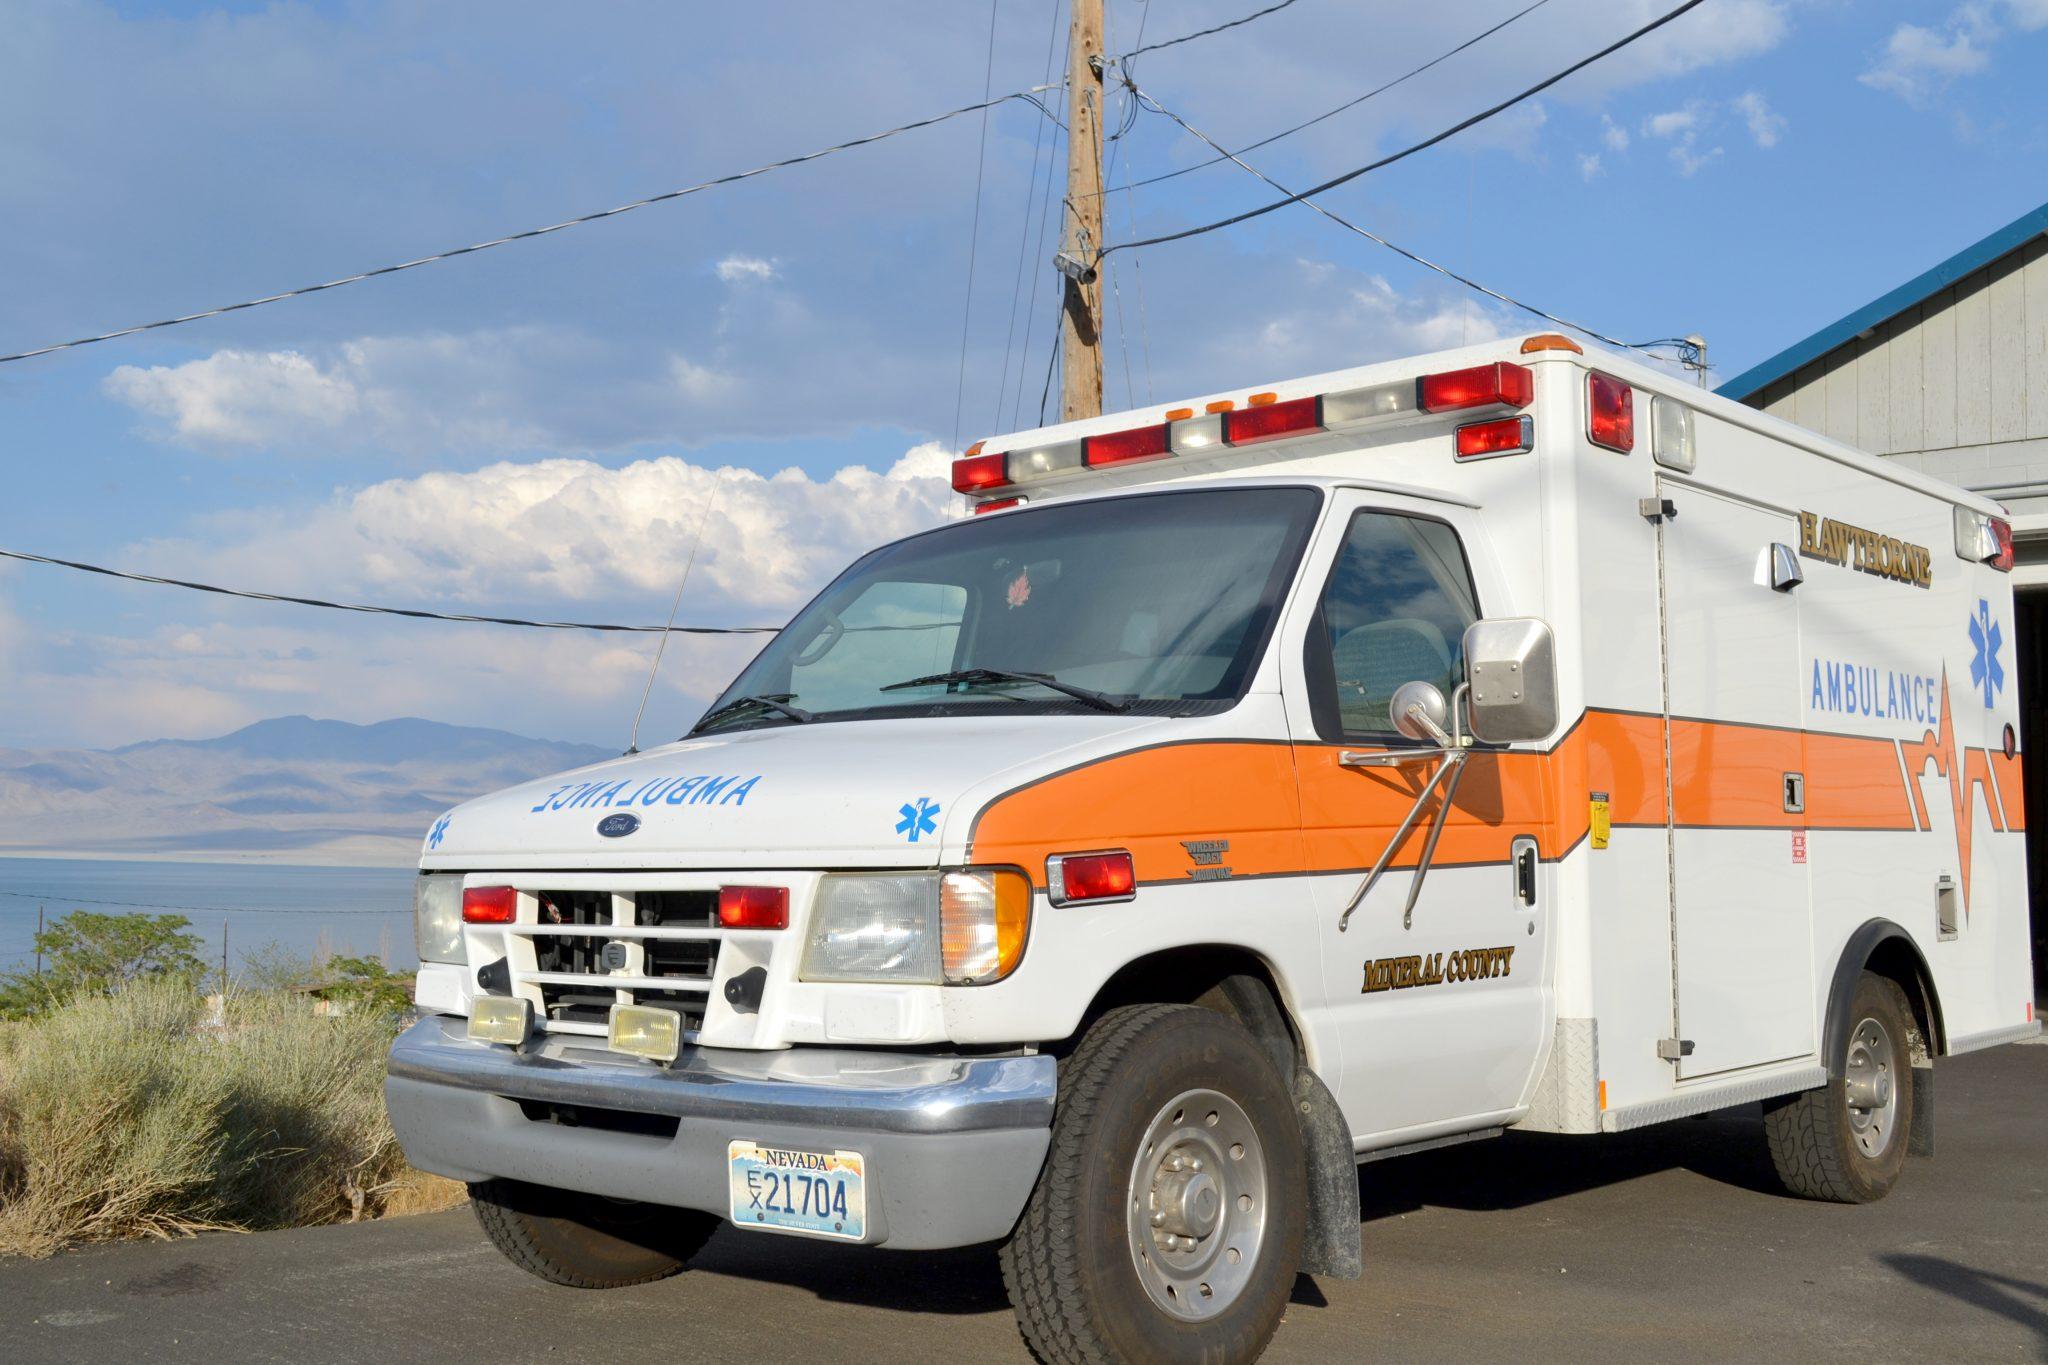 Stolen ambulance recovered at hospital